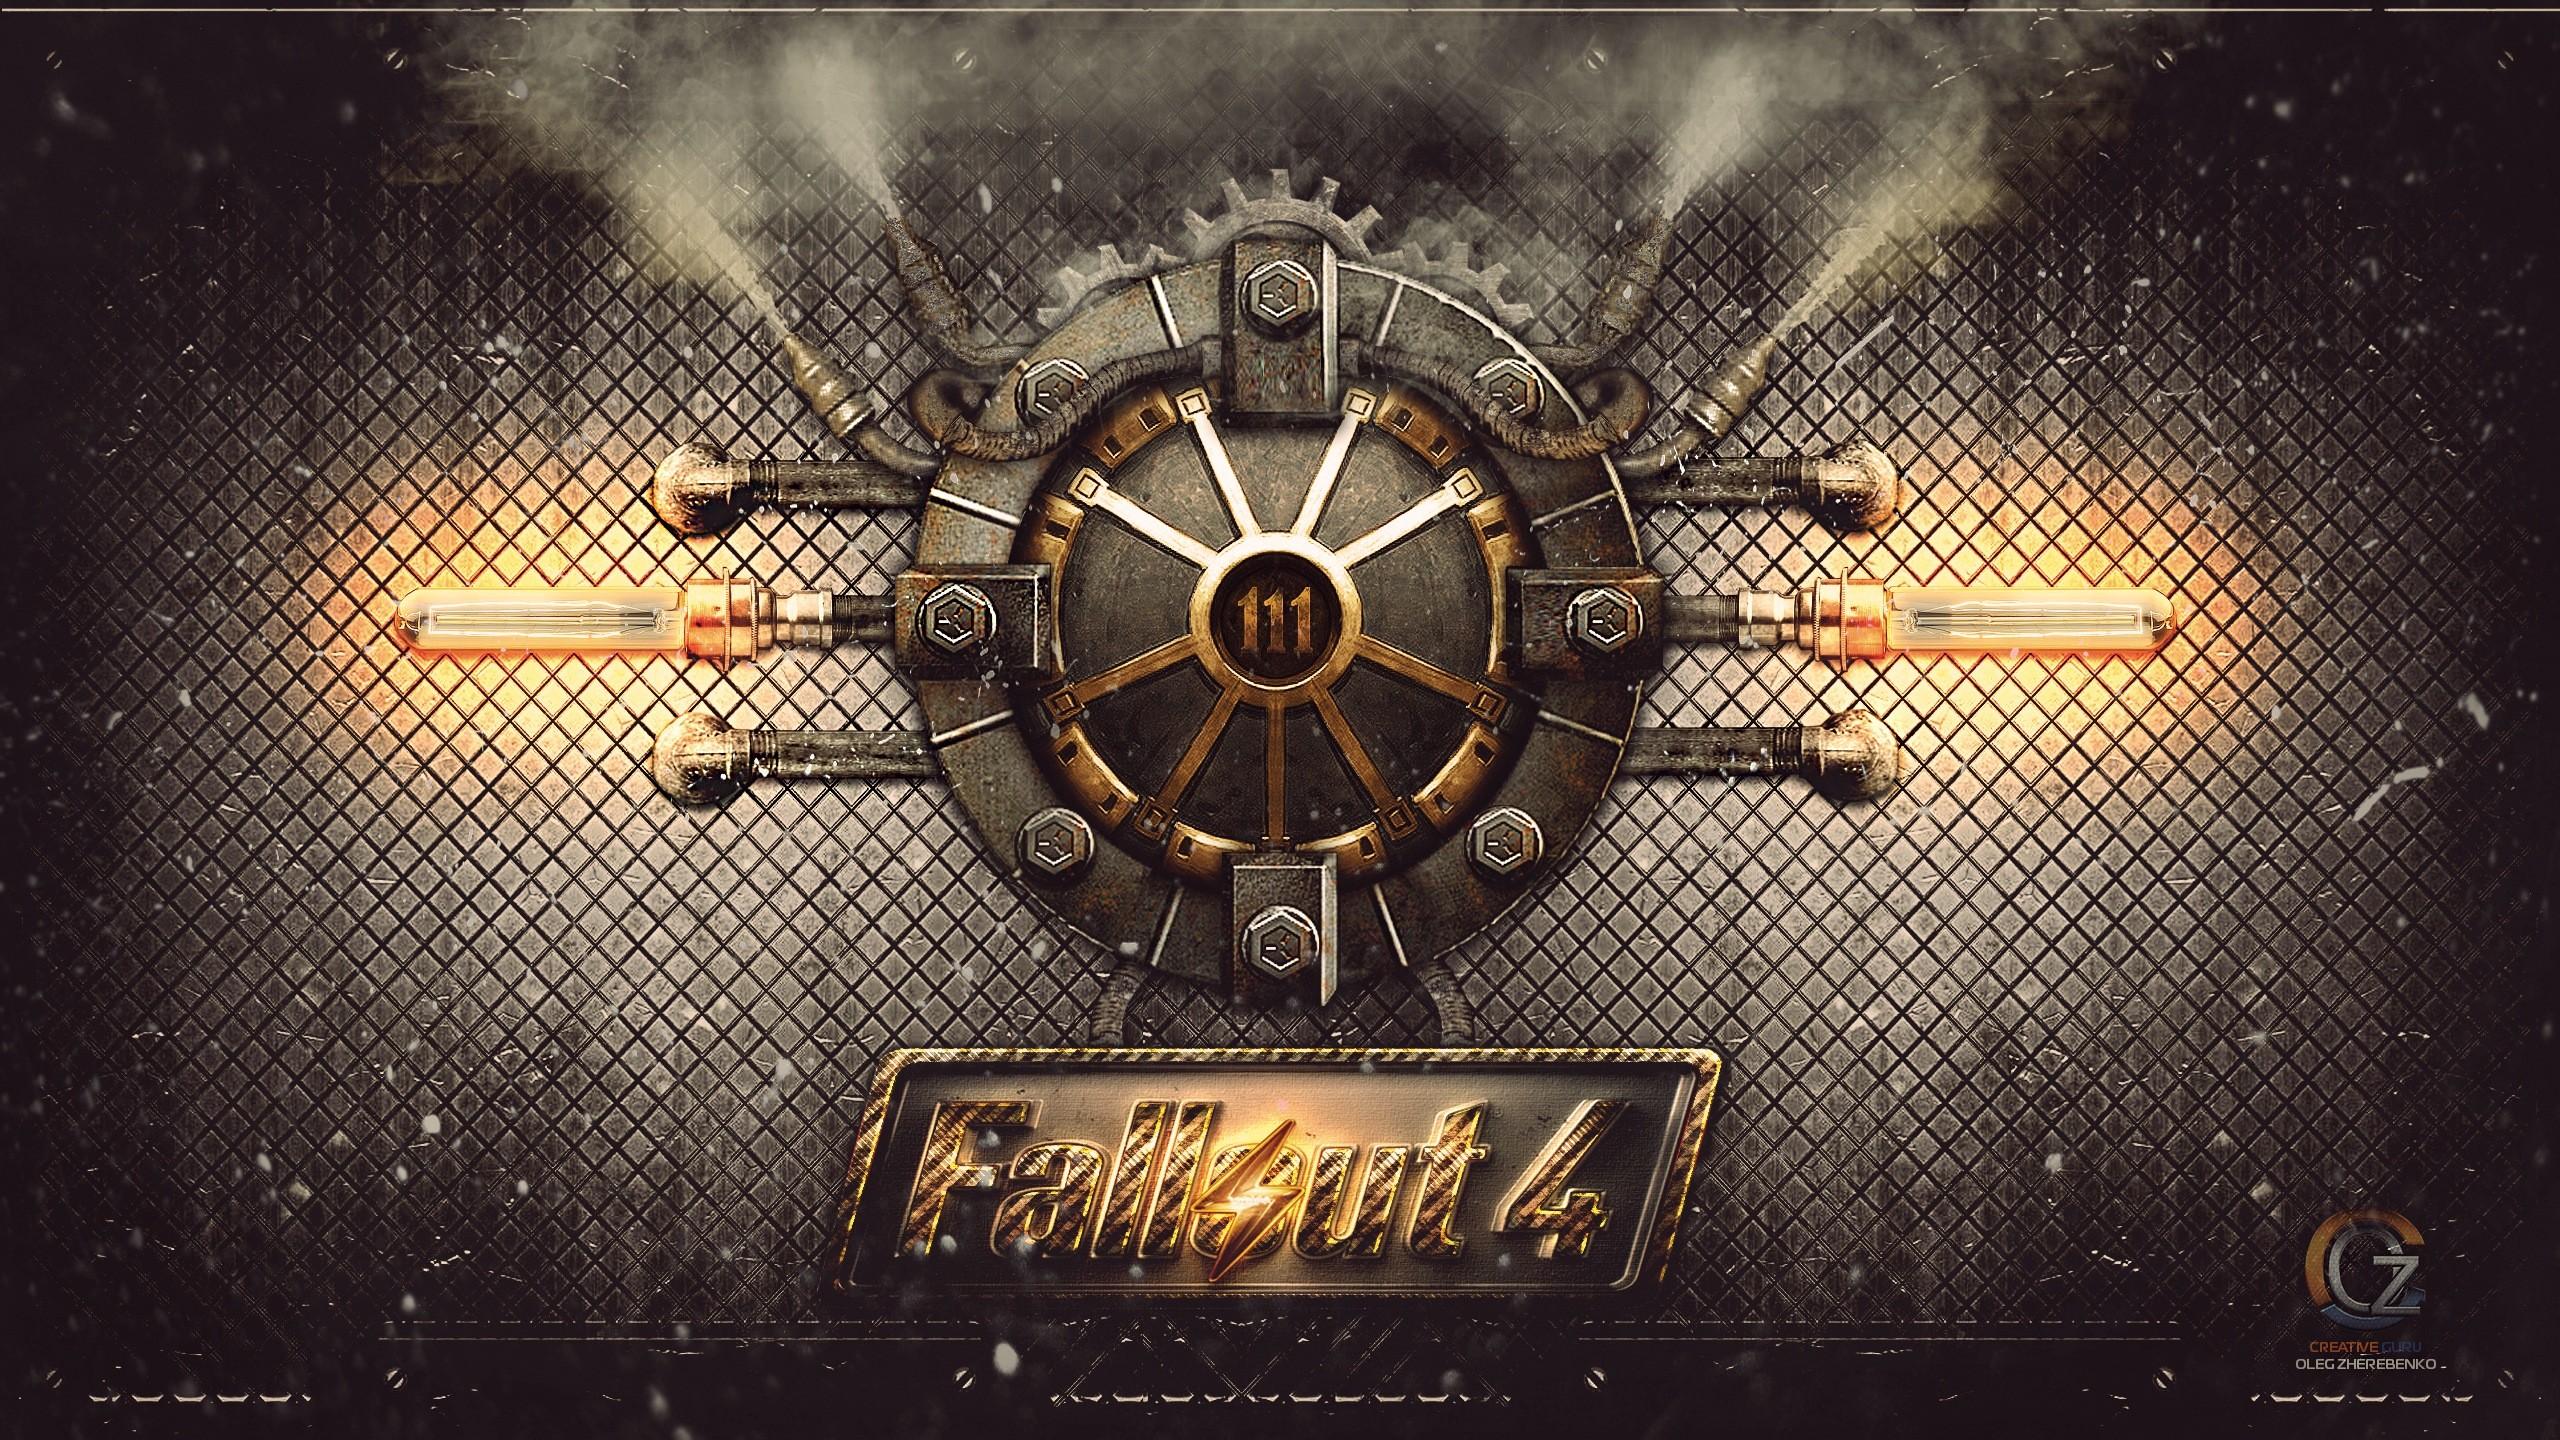 April 20, 2014: Fallout 4 4K Wallpapers, px